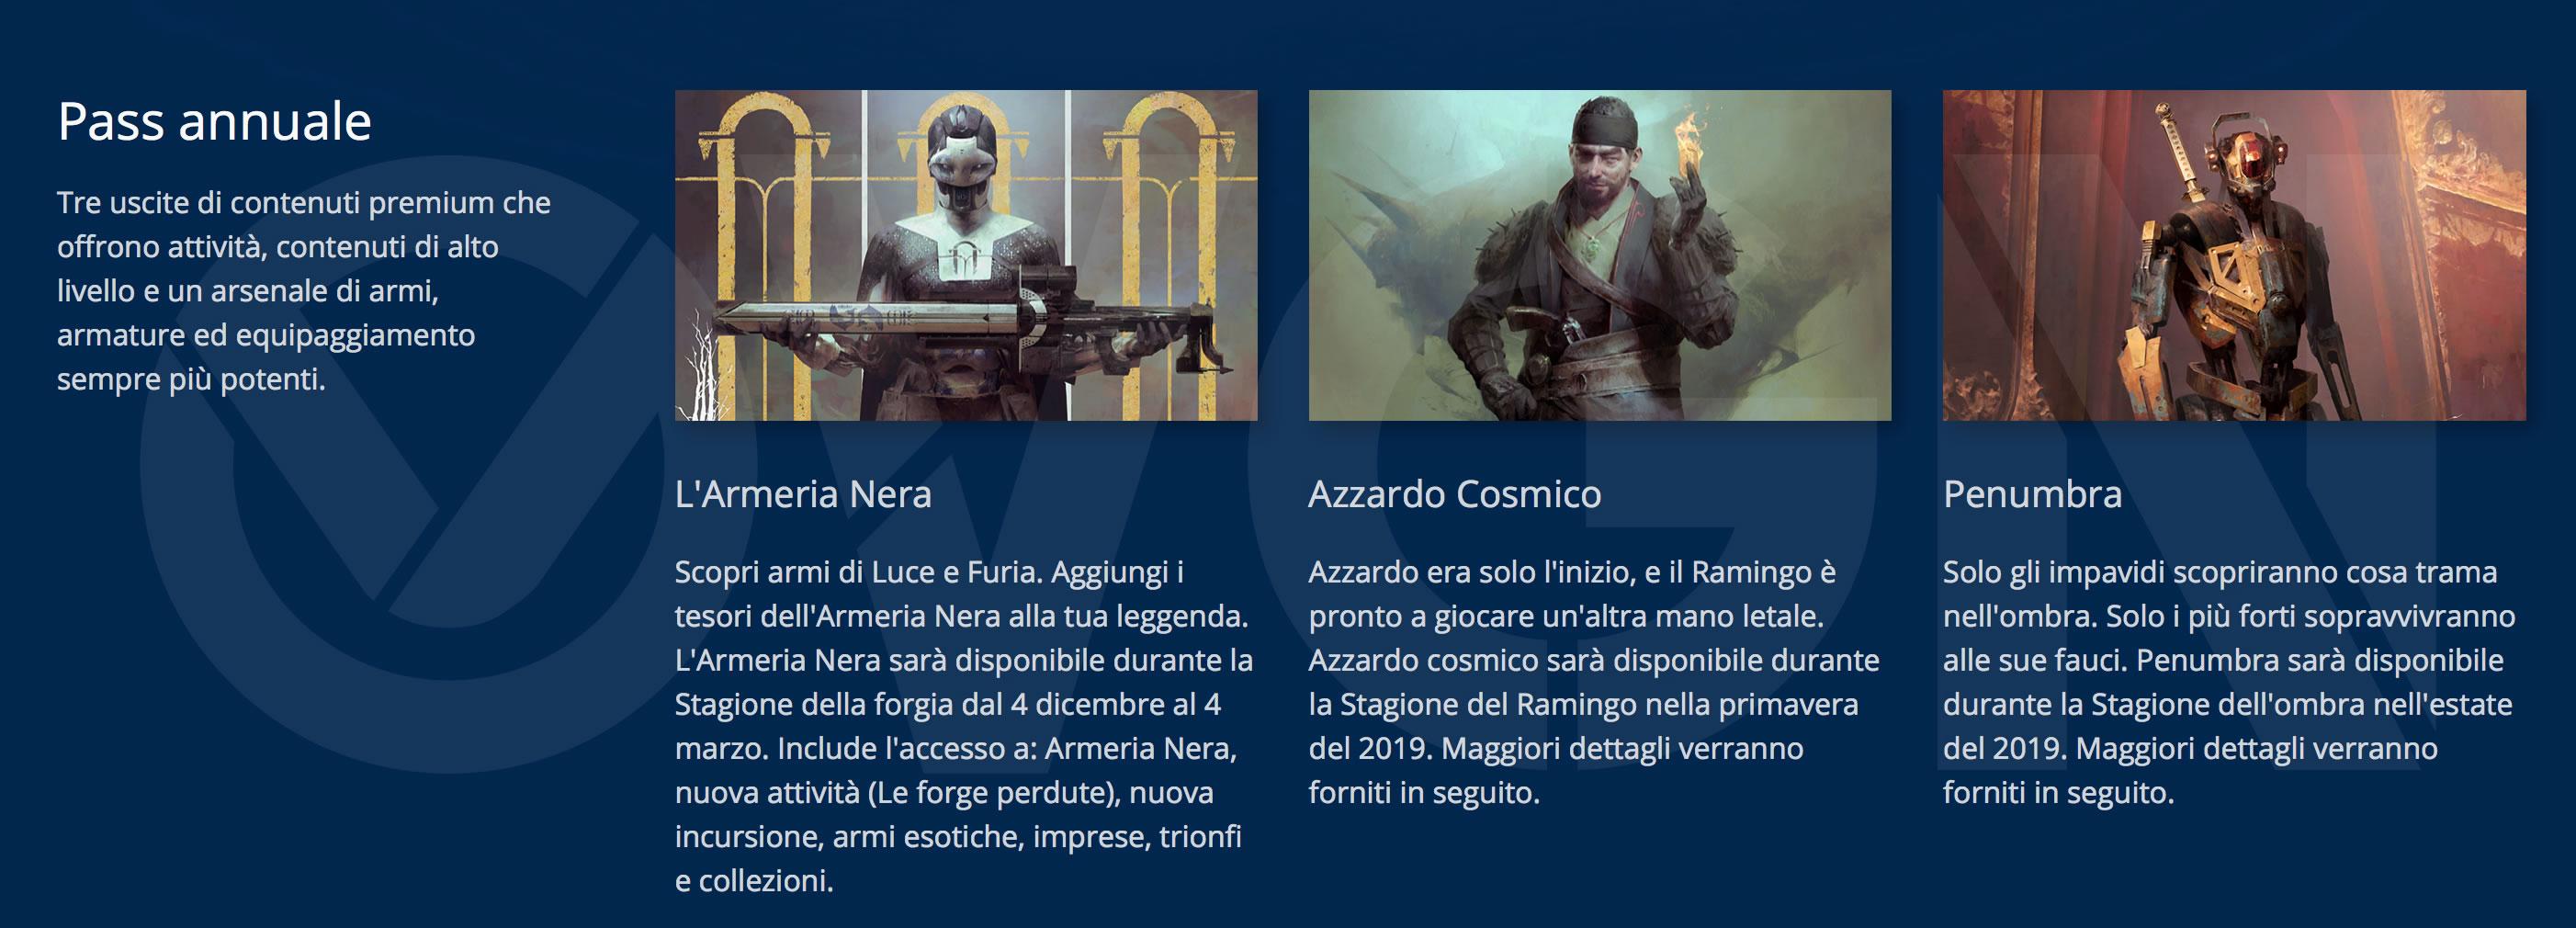 Destiny 2: I Rinnegati - Pass Annuale